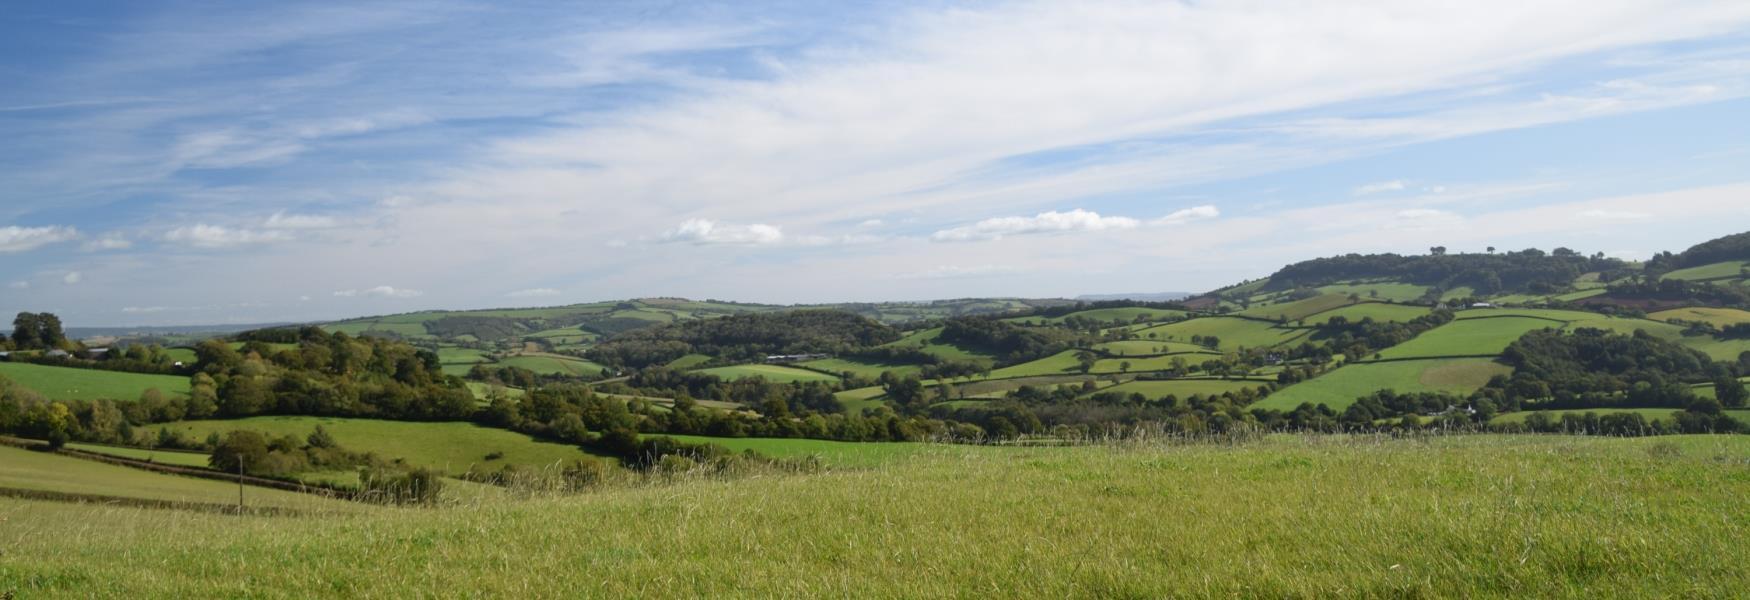 Tiverton Countryside